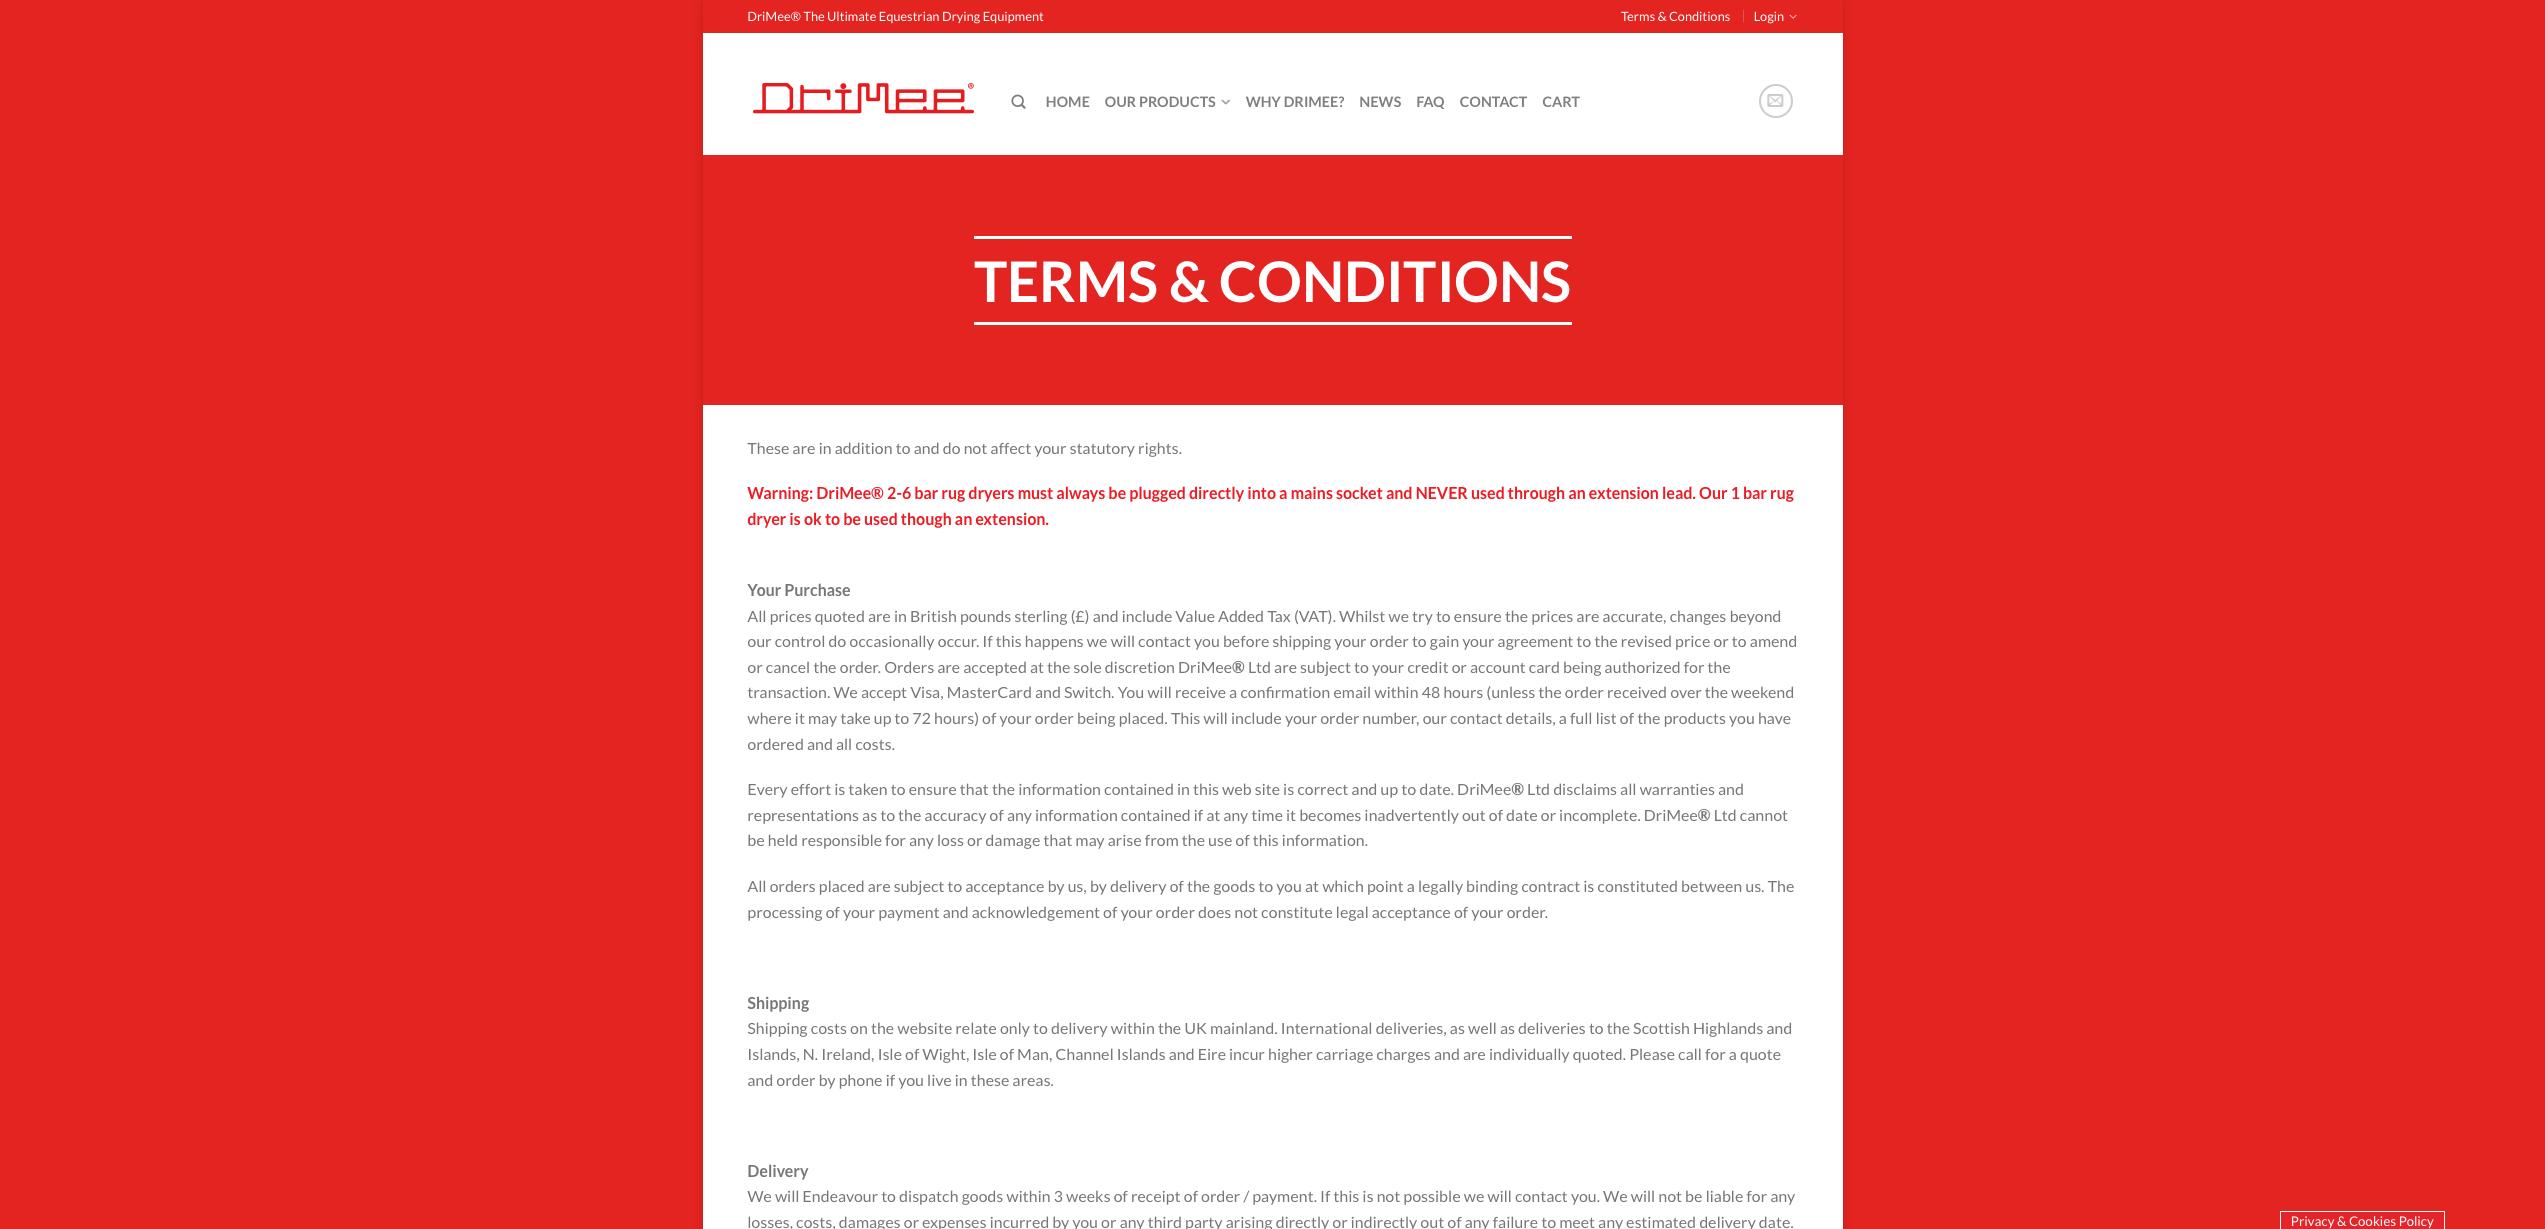 IDEA UK Design and Marketing Drimee Equestrian Horse Equipment Website Design 22